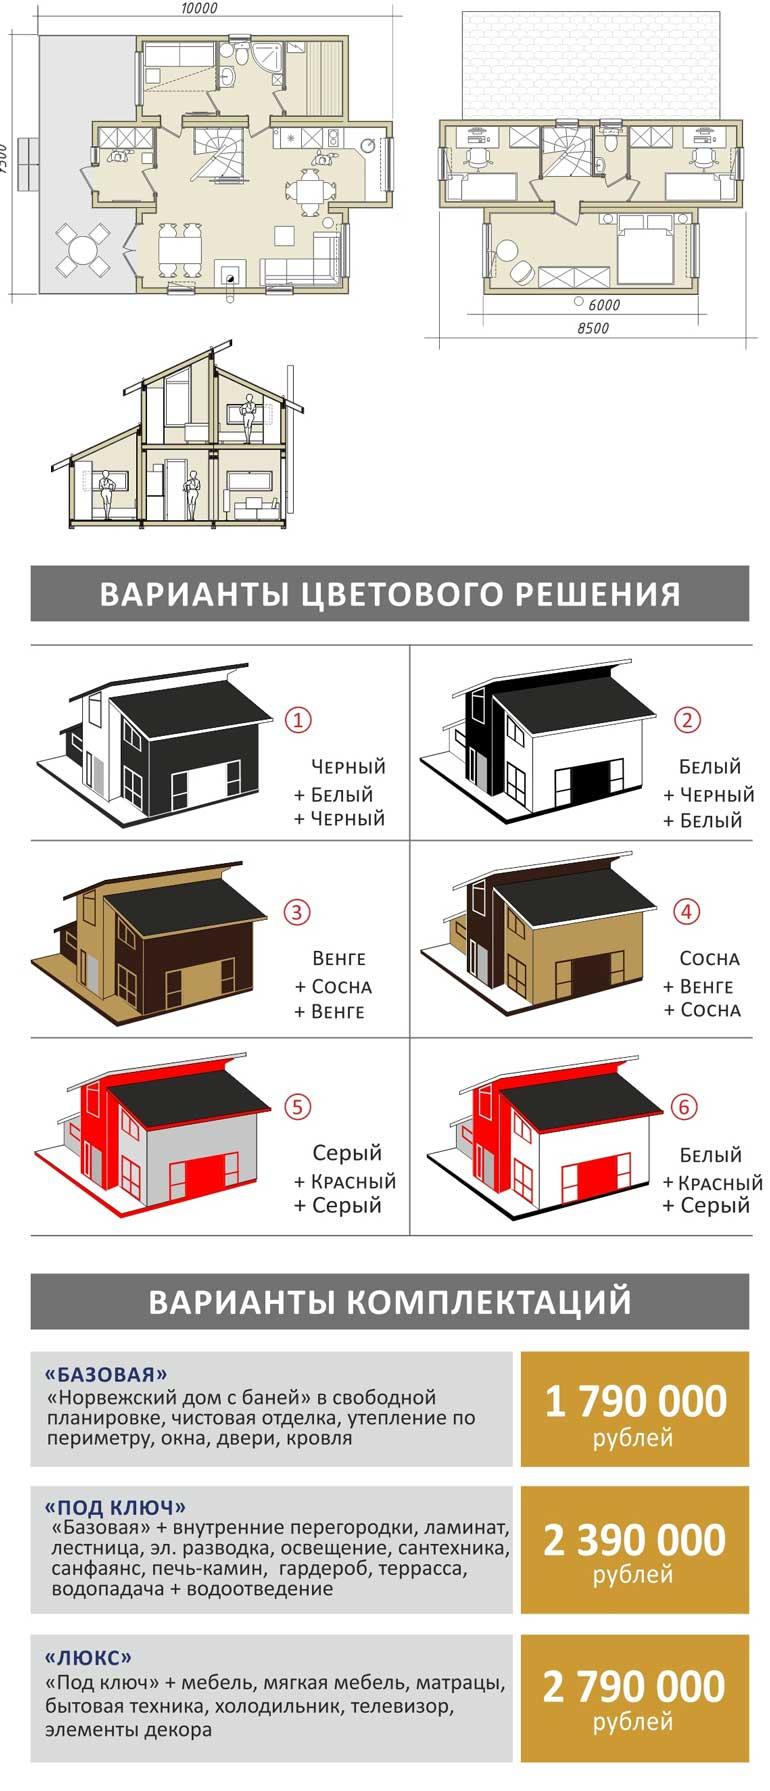 norvezhskiy-dom-banya-88-skandis-montazh-za-1-den